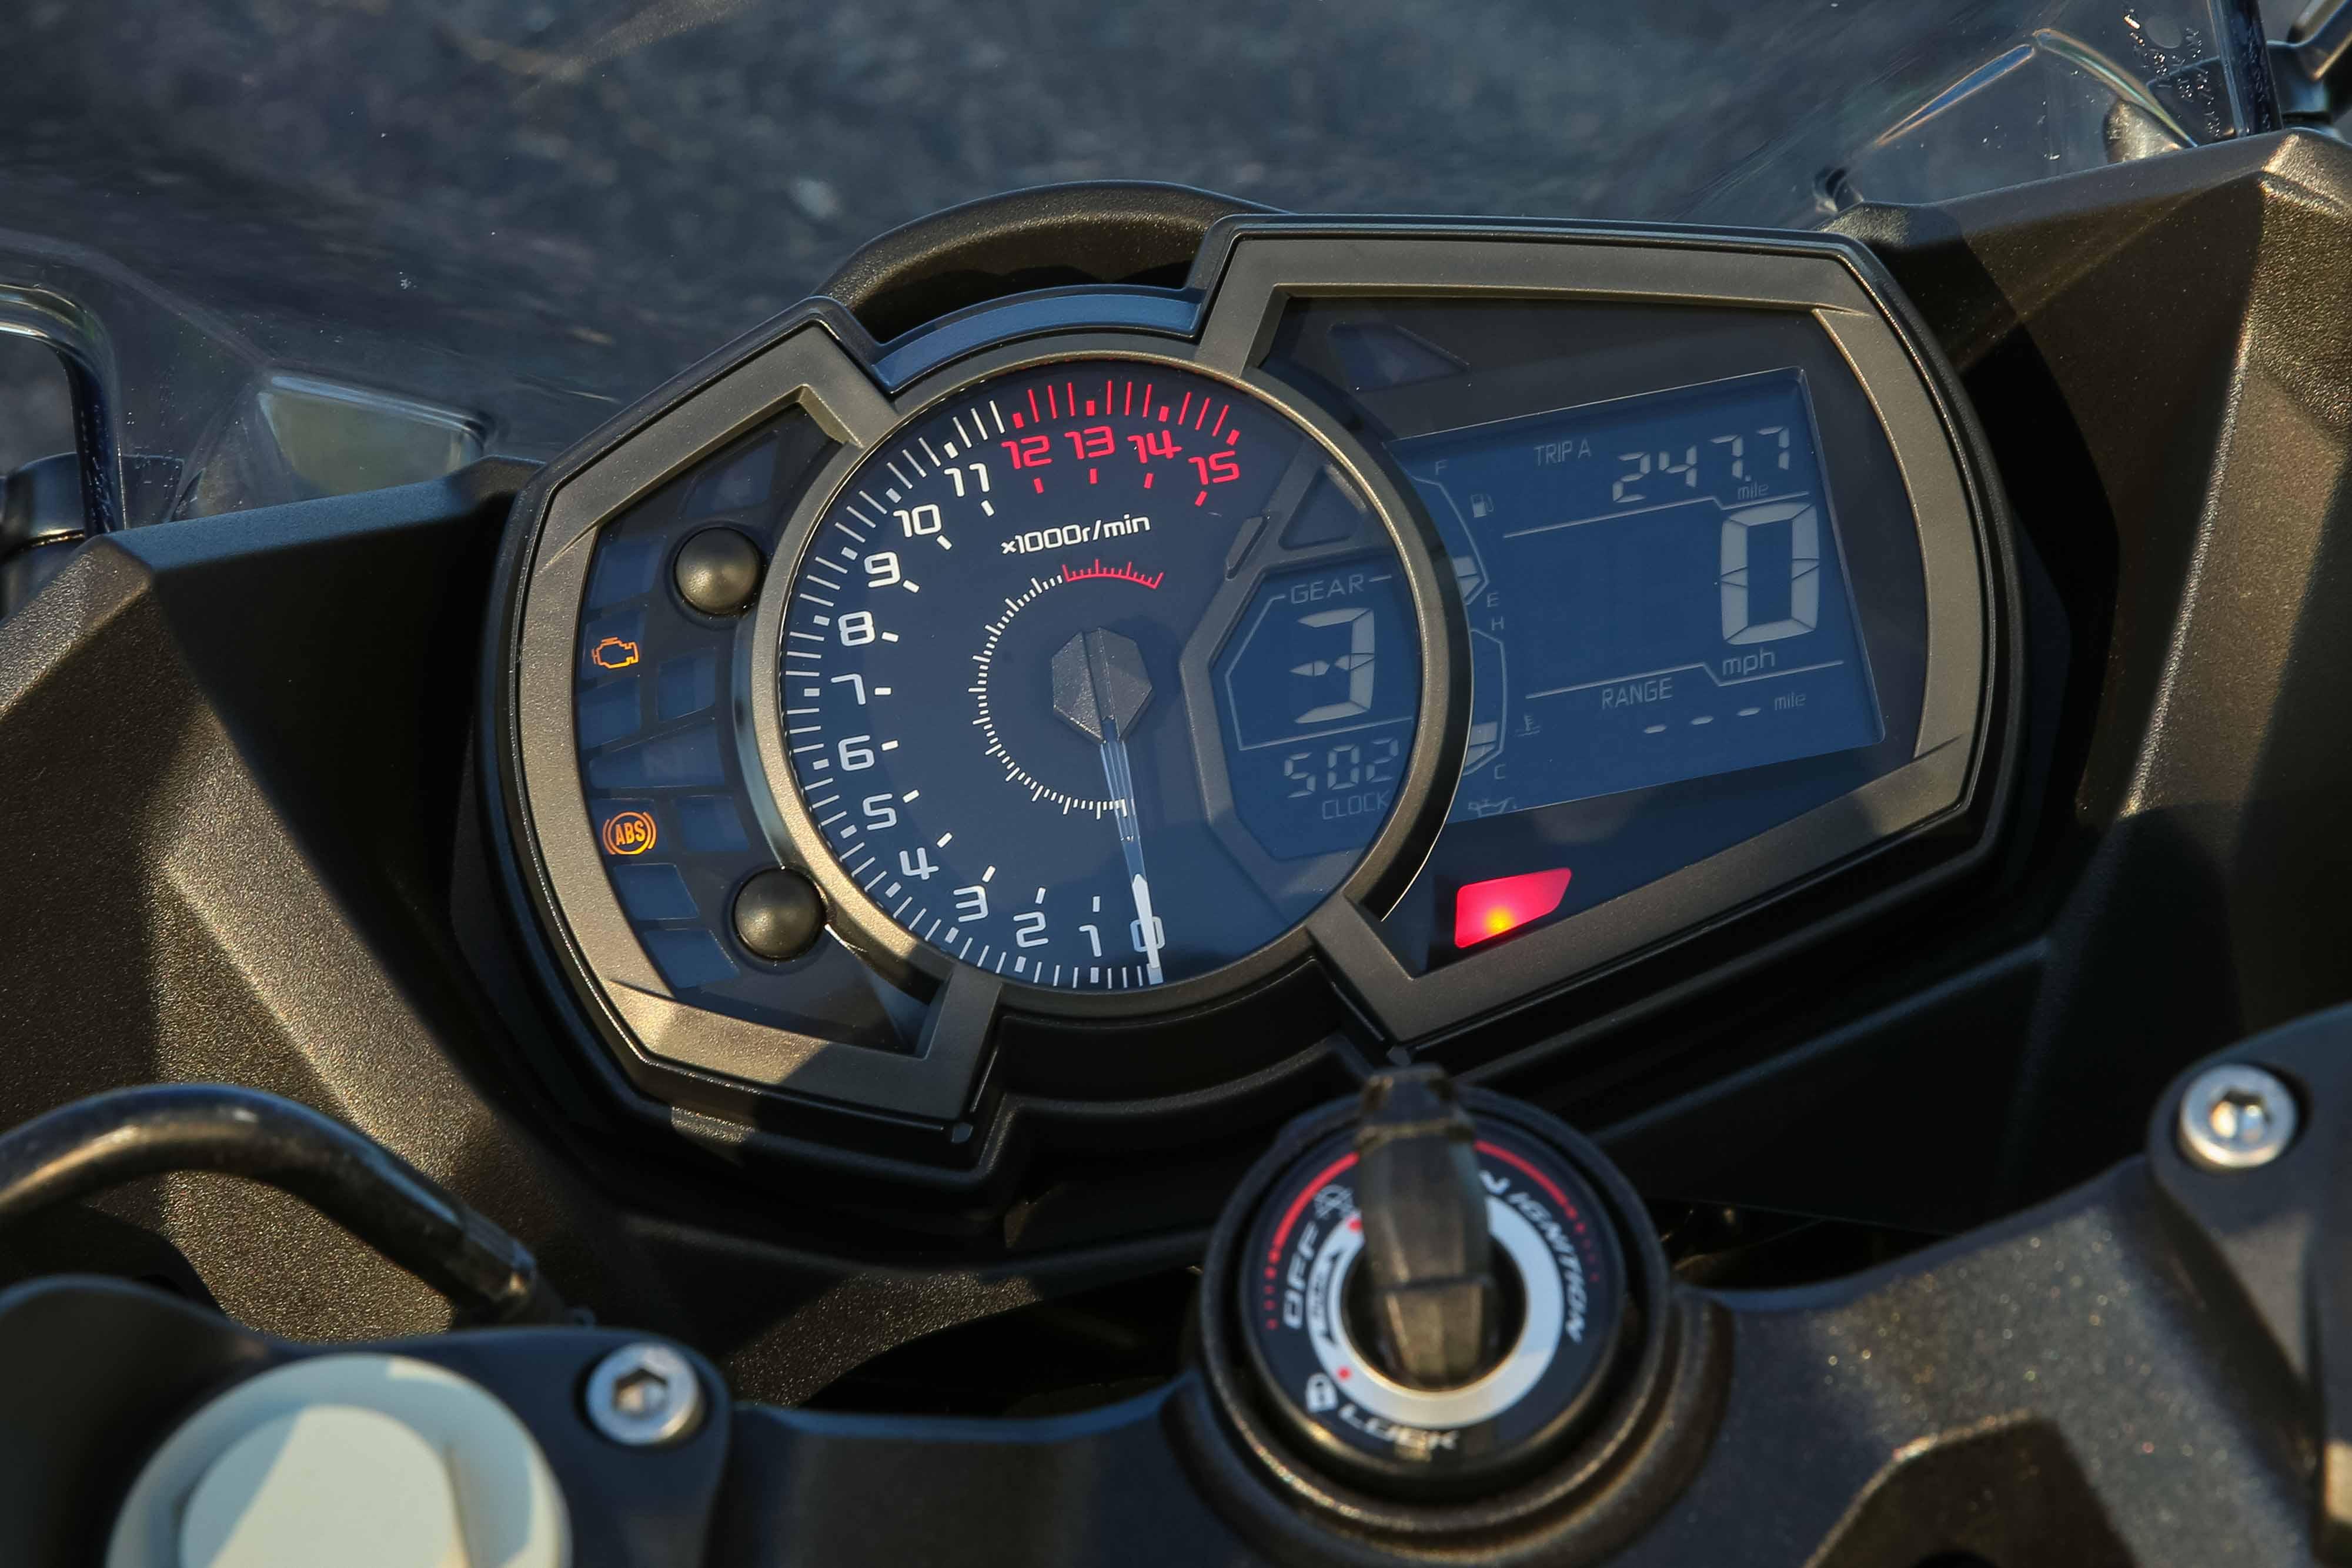 Replacing dash : motorcycles